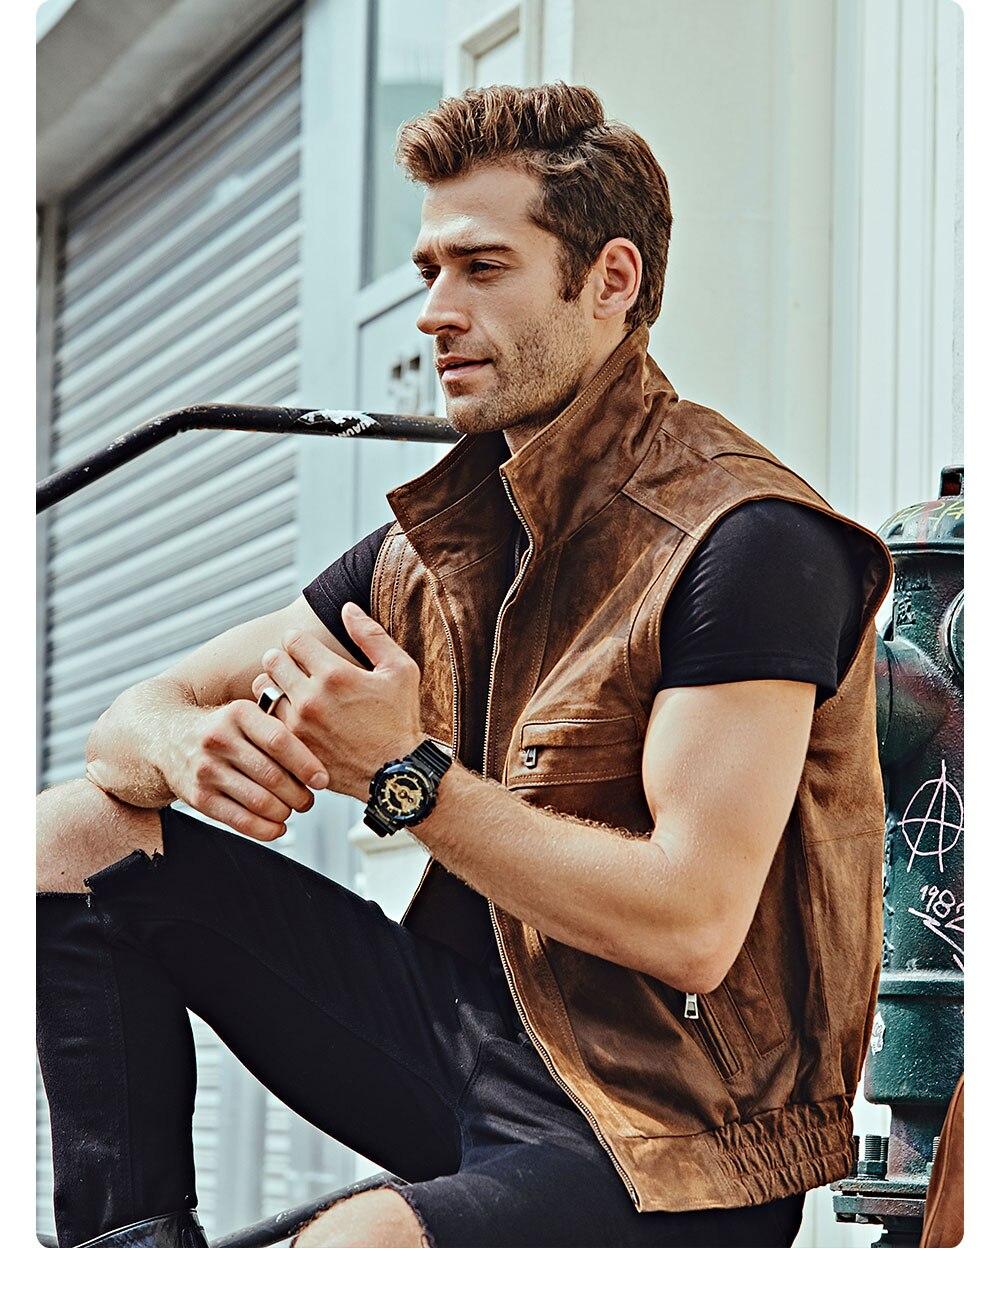 Hd8fc0f7bb4f3450d91882a6227757917G Mew Men's Leather Retro Vest Stand Collar Men's Motorcycle Casual Vest